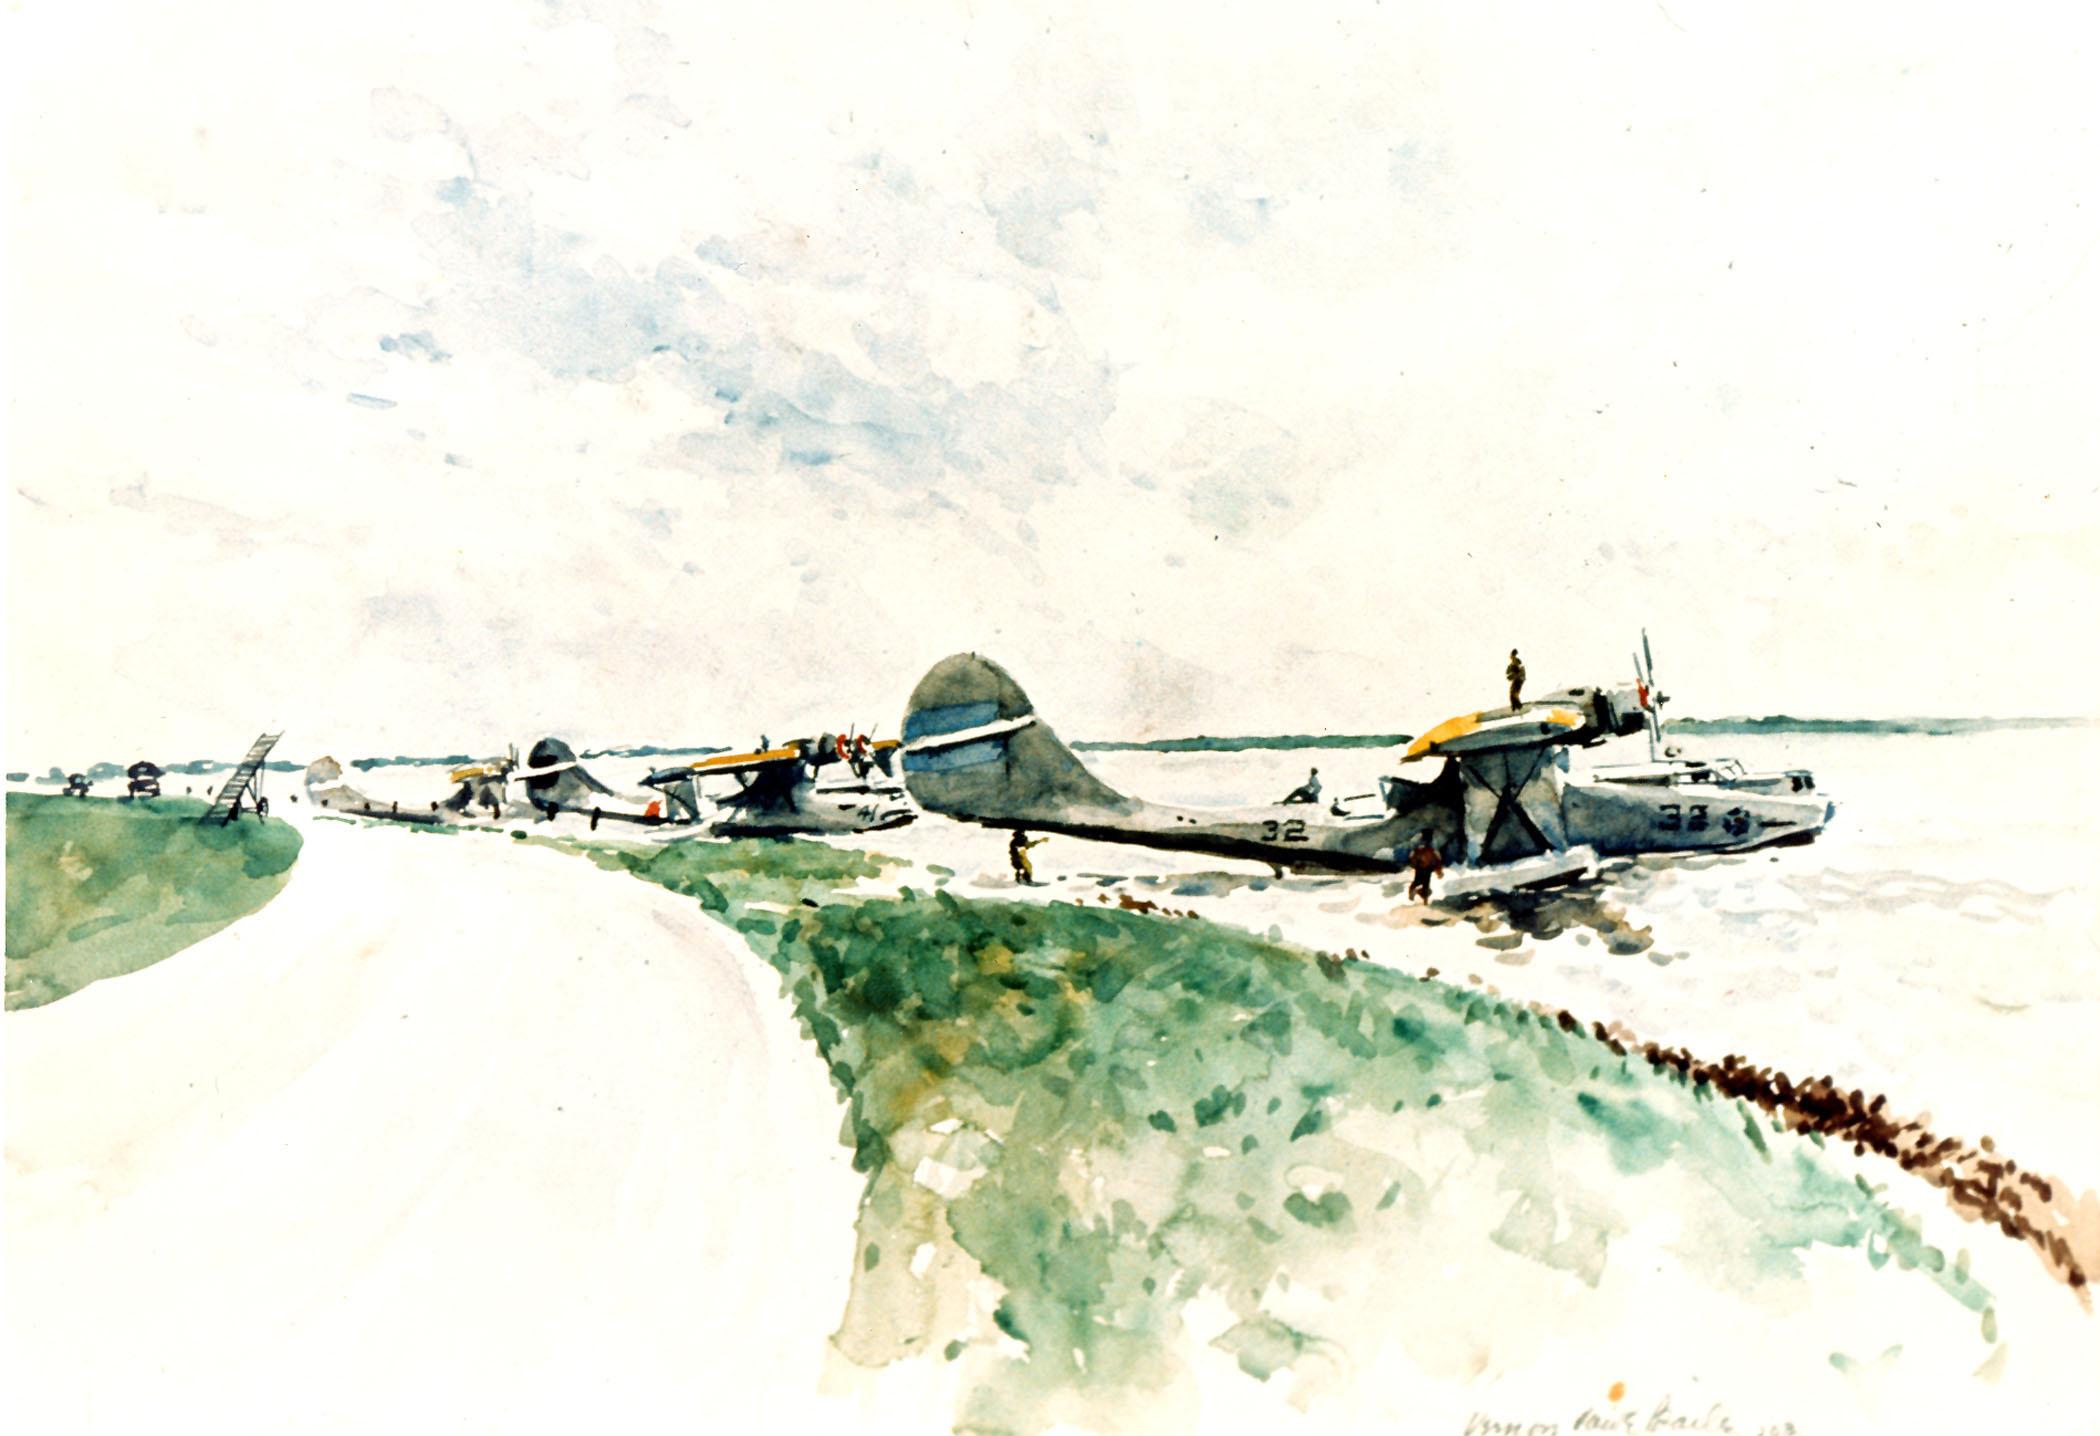 PBY Patrol planes at the beach.